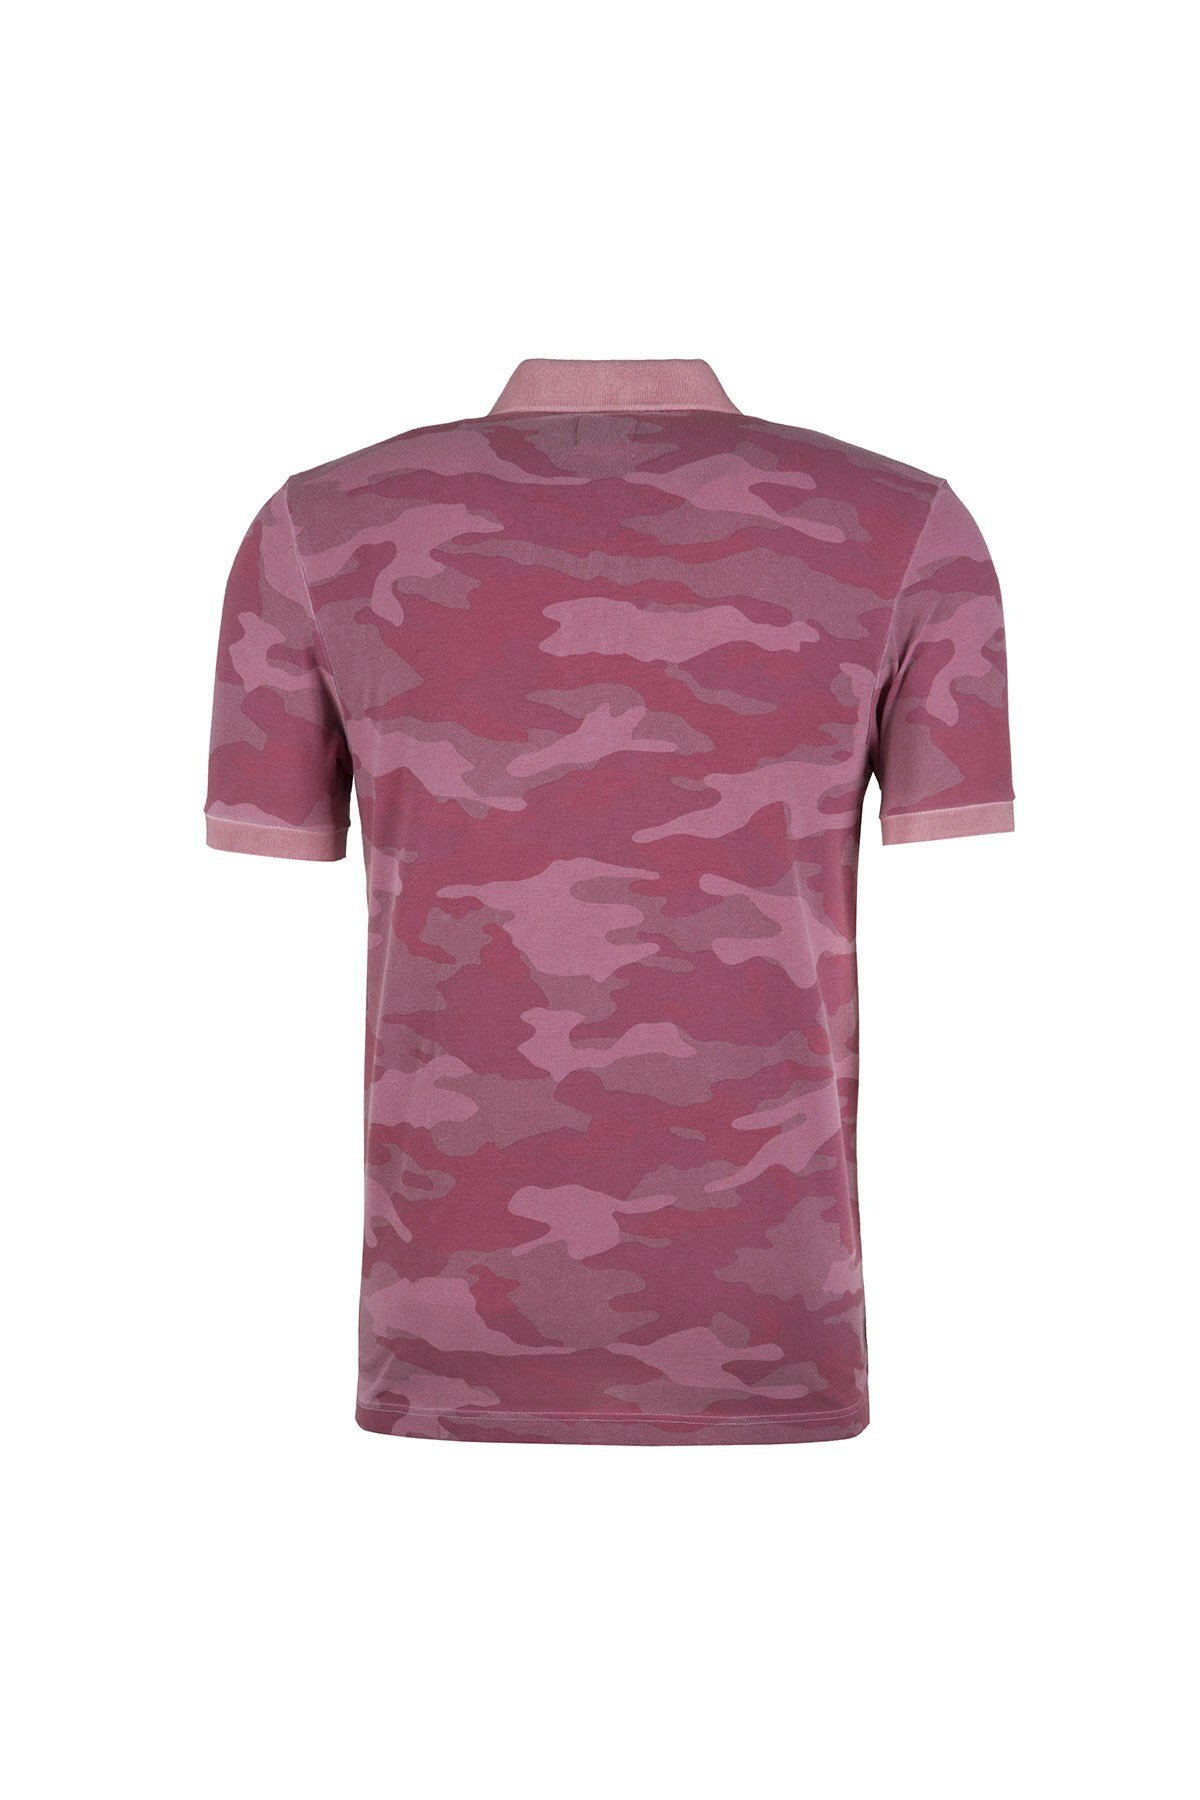 GRAN SASSO T SHIRT Erkek T Shirt 6017677020243 KIRMIZI